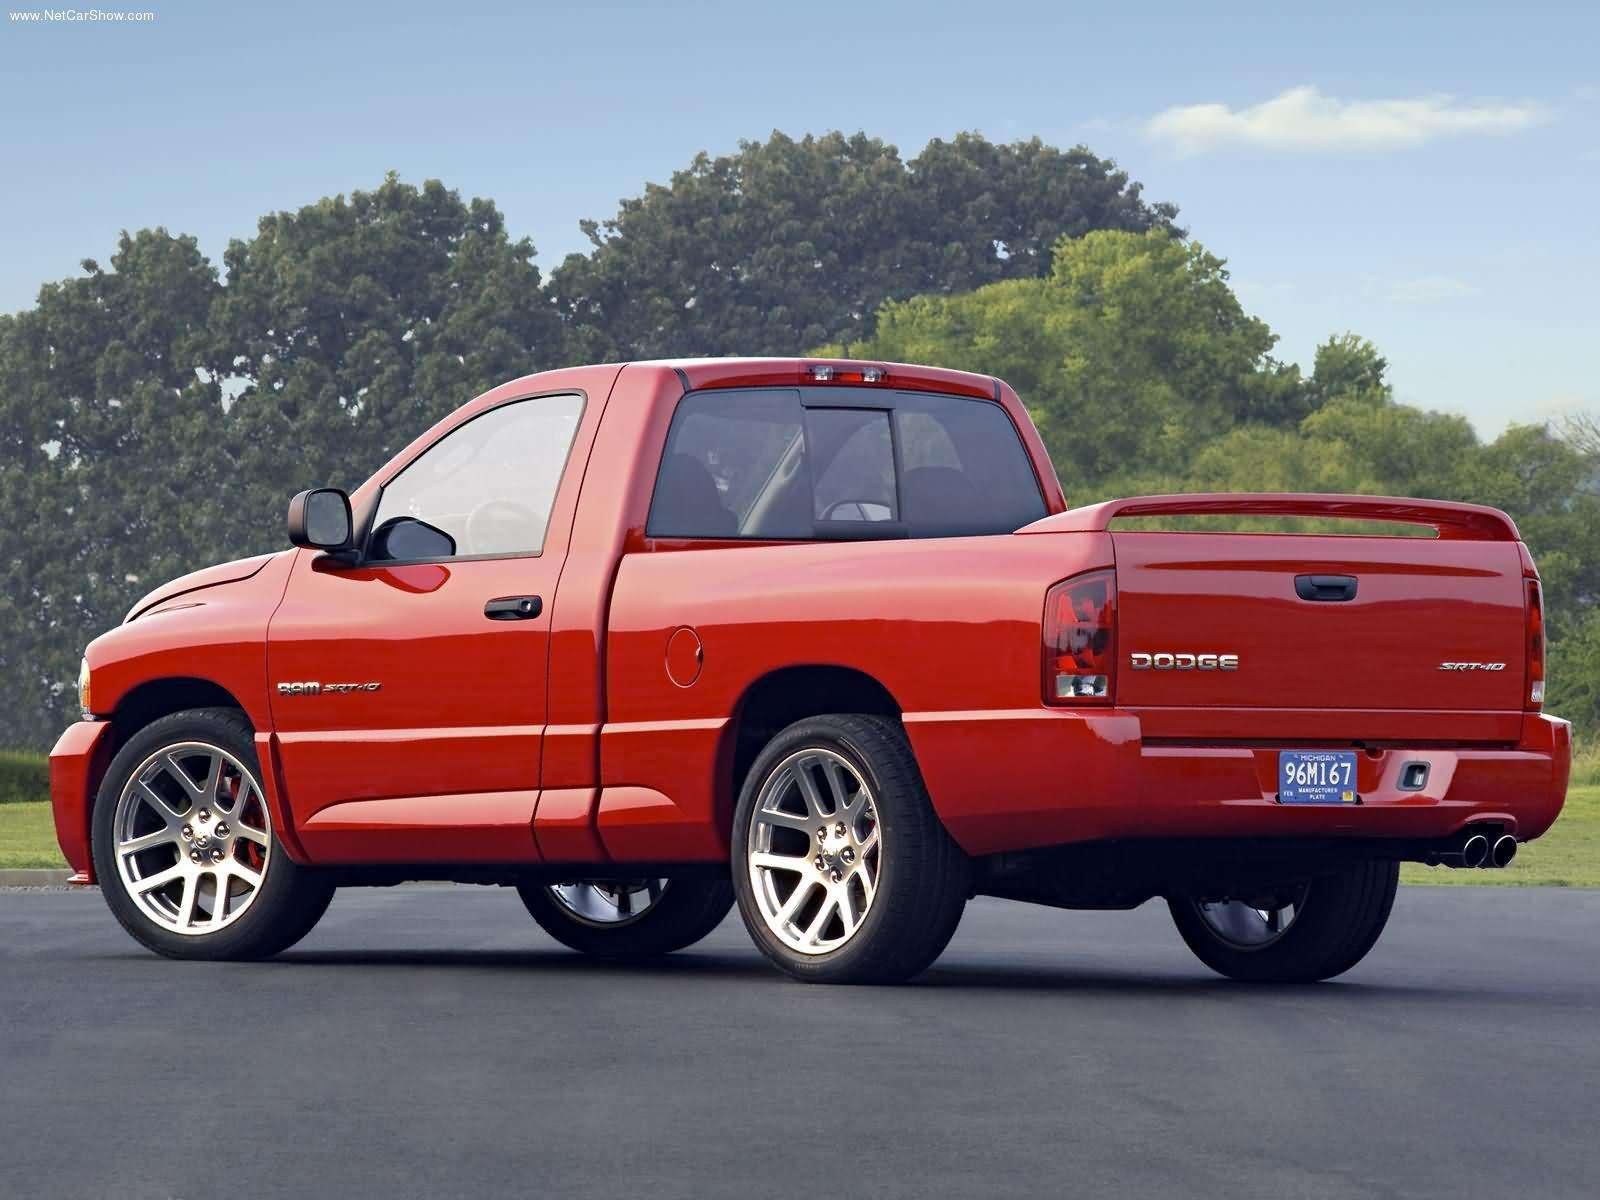 Dodge car tuning part 3 -  Dodge Ram Srt 10 Pickup 2006